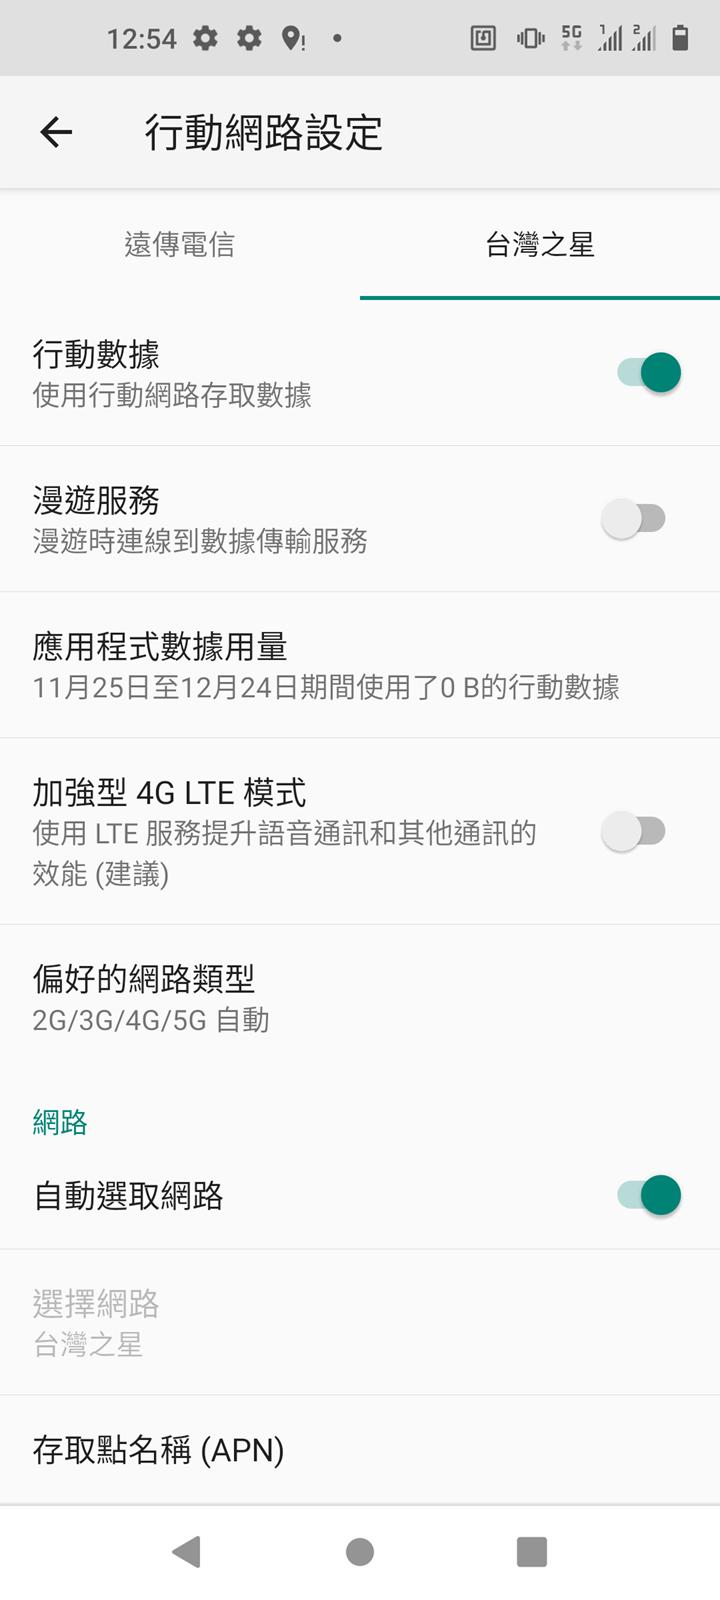 HTC U20 5G 系統更新 2.01.709.2 版本系統更新,正式支援 5G + 4G 雙卡雙待功能 @3C 達人廖阿輝